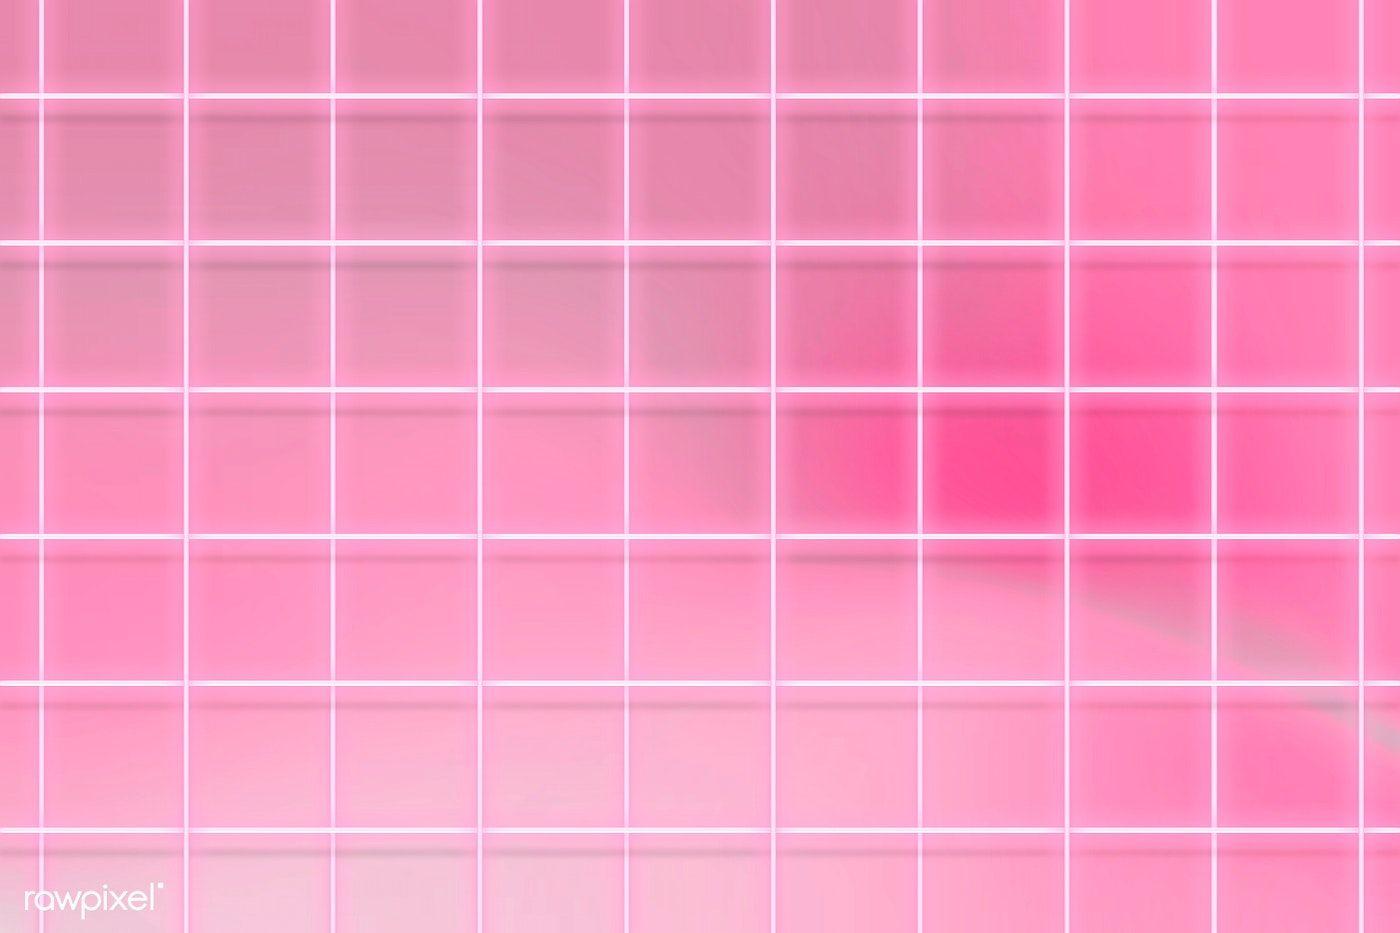 Download Premium Illustration Of Neon Pink Grid Patterned Background Background Patterns Pink Wallpaper Backgrounds Neon Backgrounds Aesthetic light pink grid wallpaper